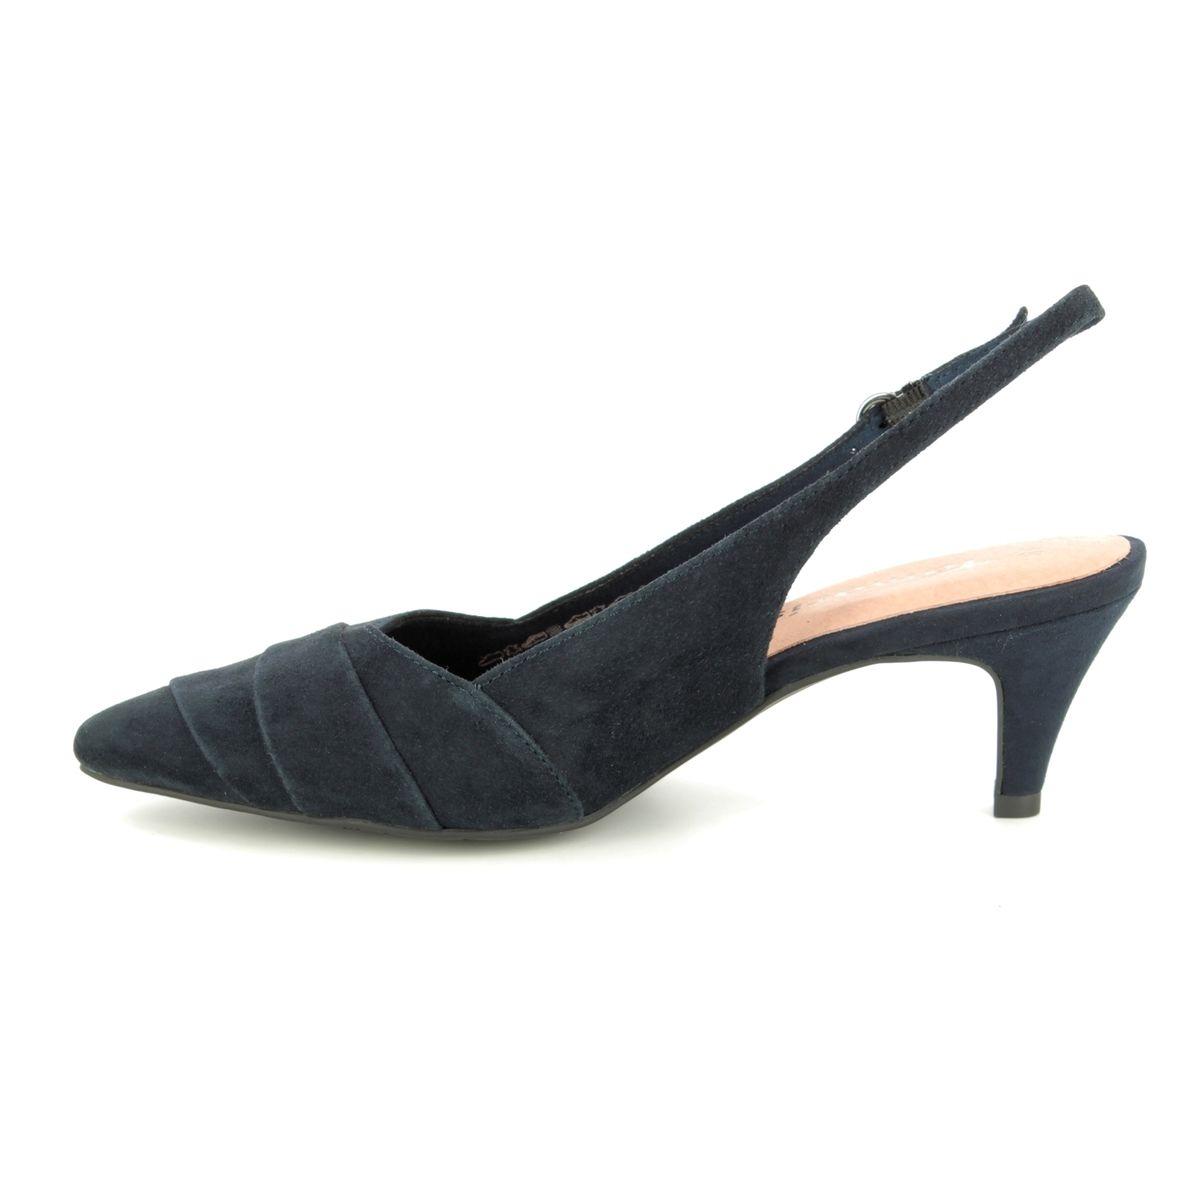 321df0d306c Tamaris Slingback Shoes - Navy suede - 29616 32 805 FATSIA SLING